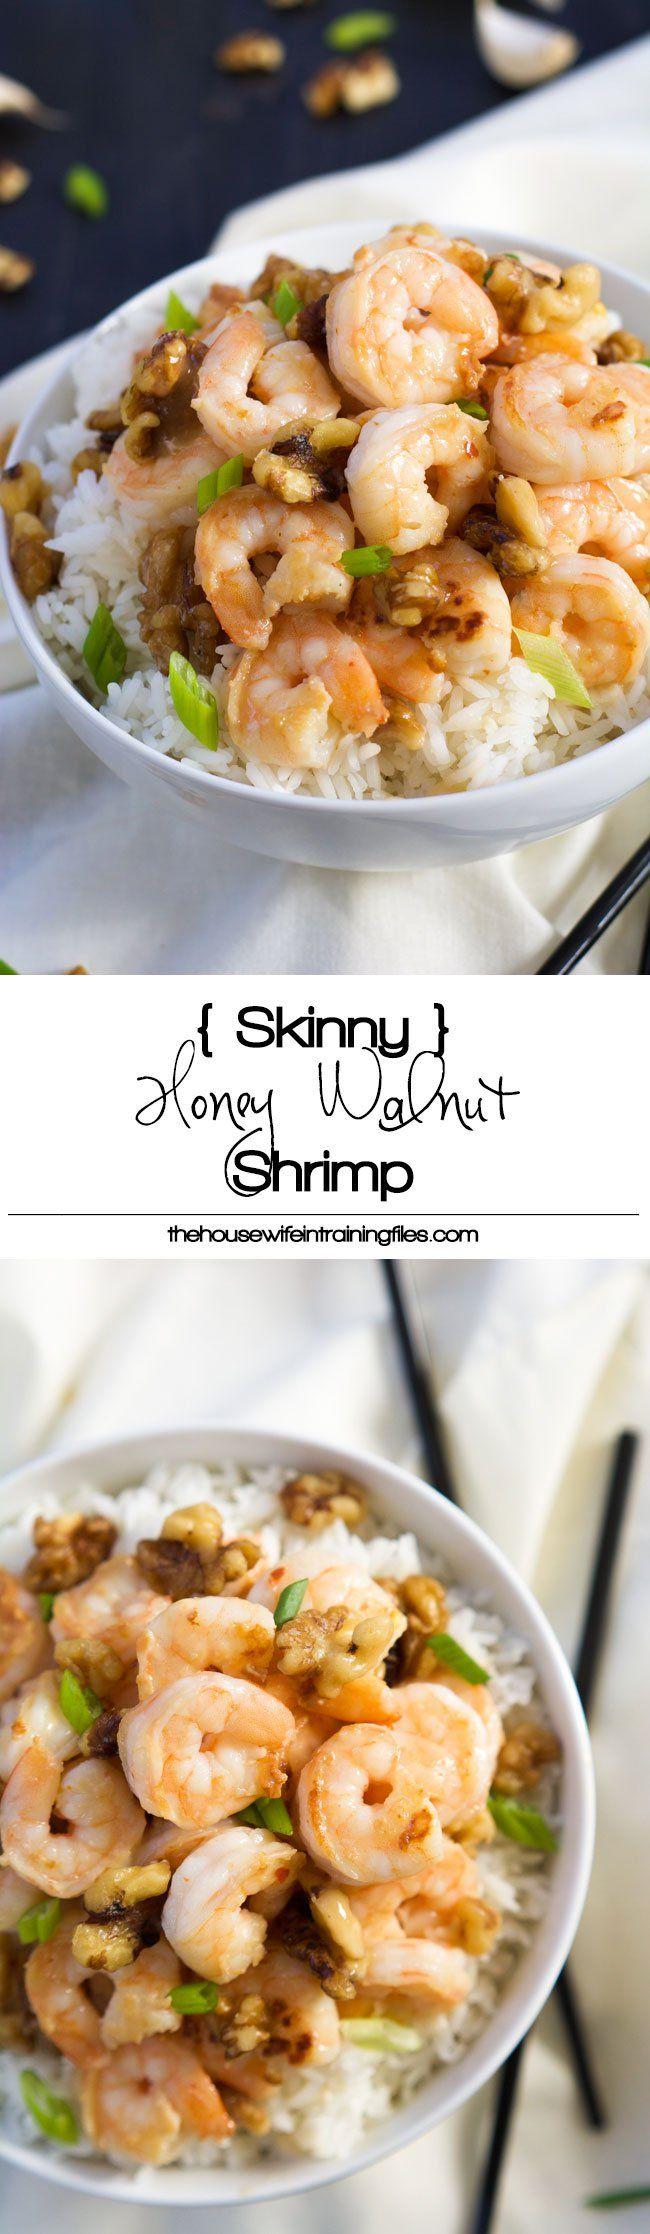 Best Skinny Honey Walnut Shrimp Recipe | Healthy, Easy, Paleo, Copycat, Sauce, Gluten Free, How to Make, Light